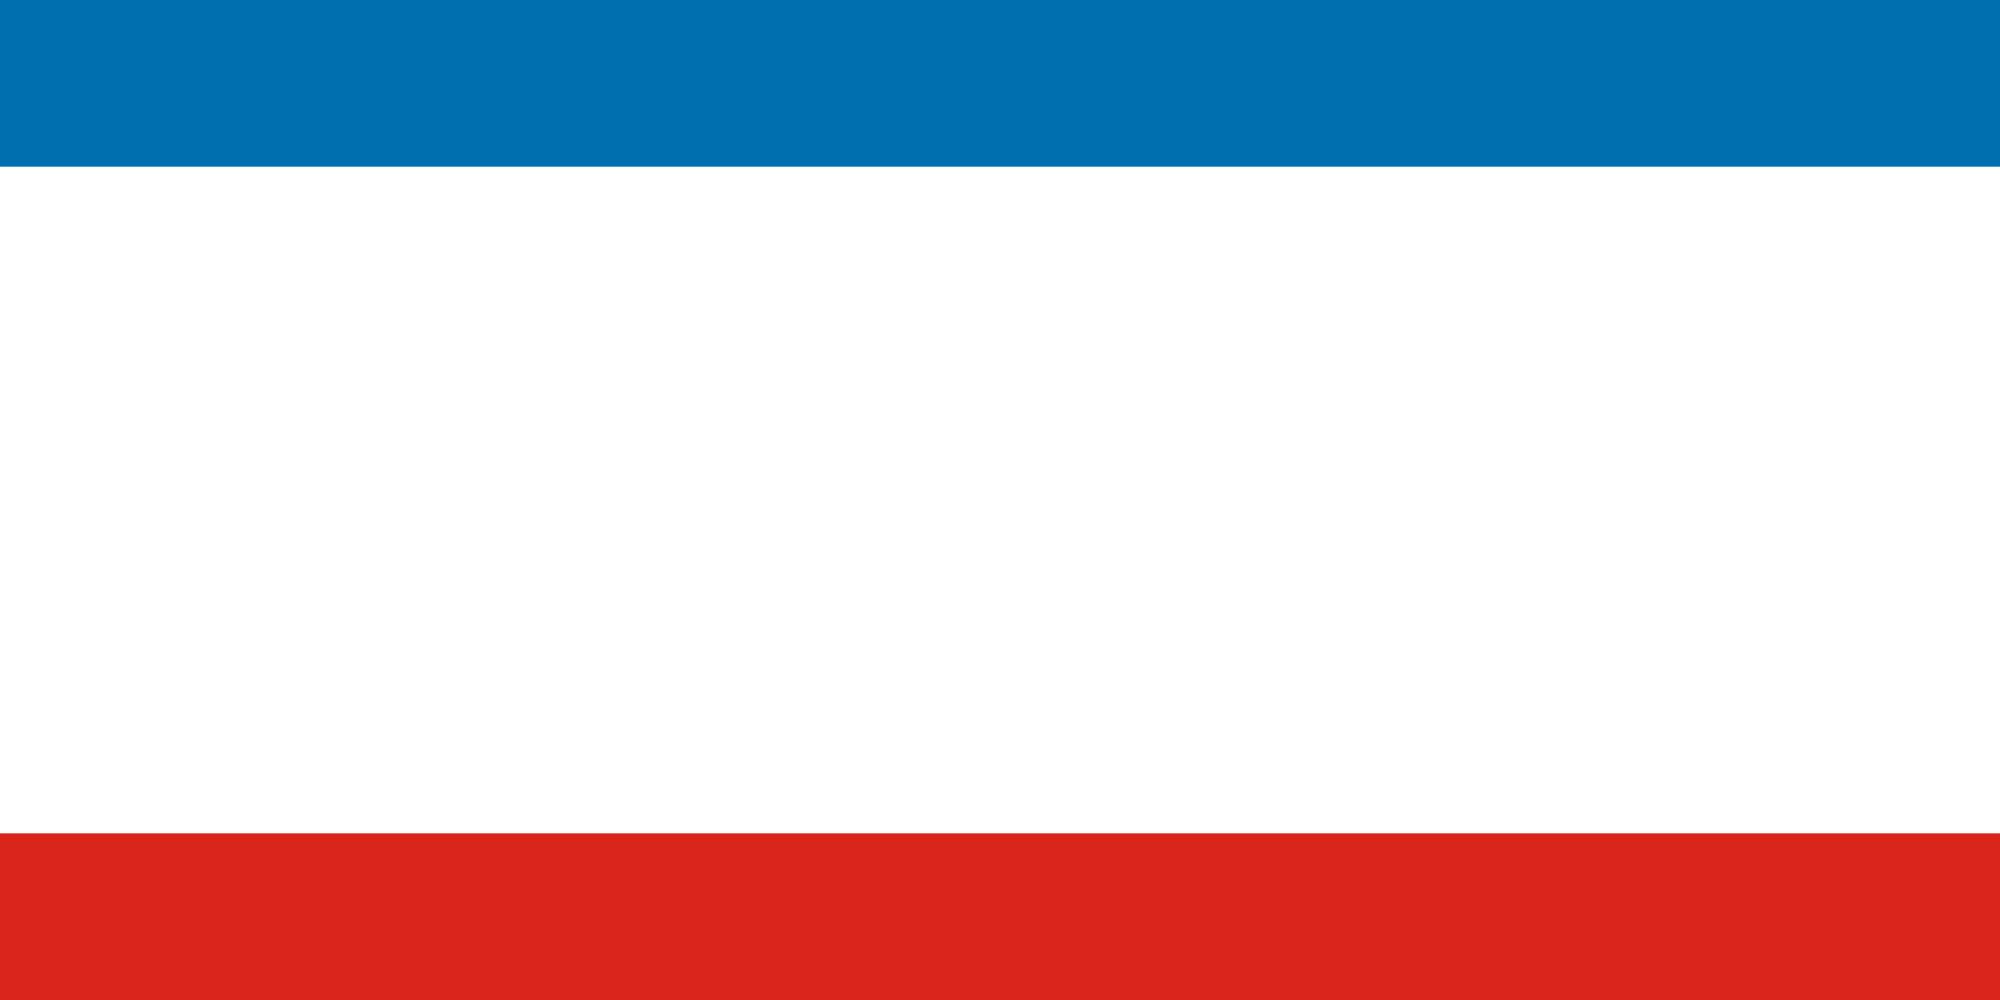 Crimea svg #5, Download drawings